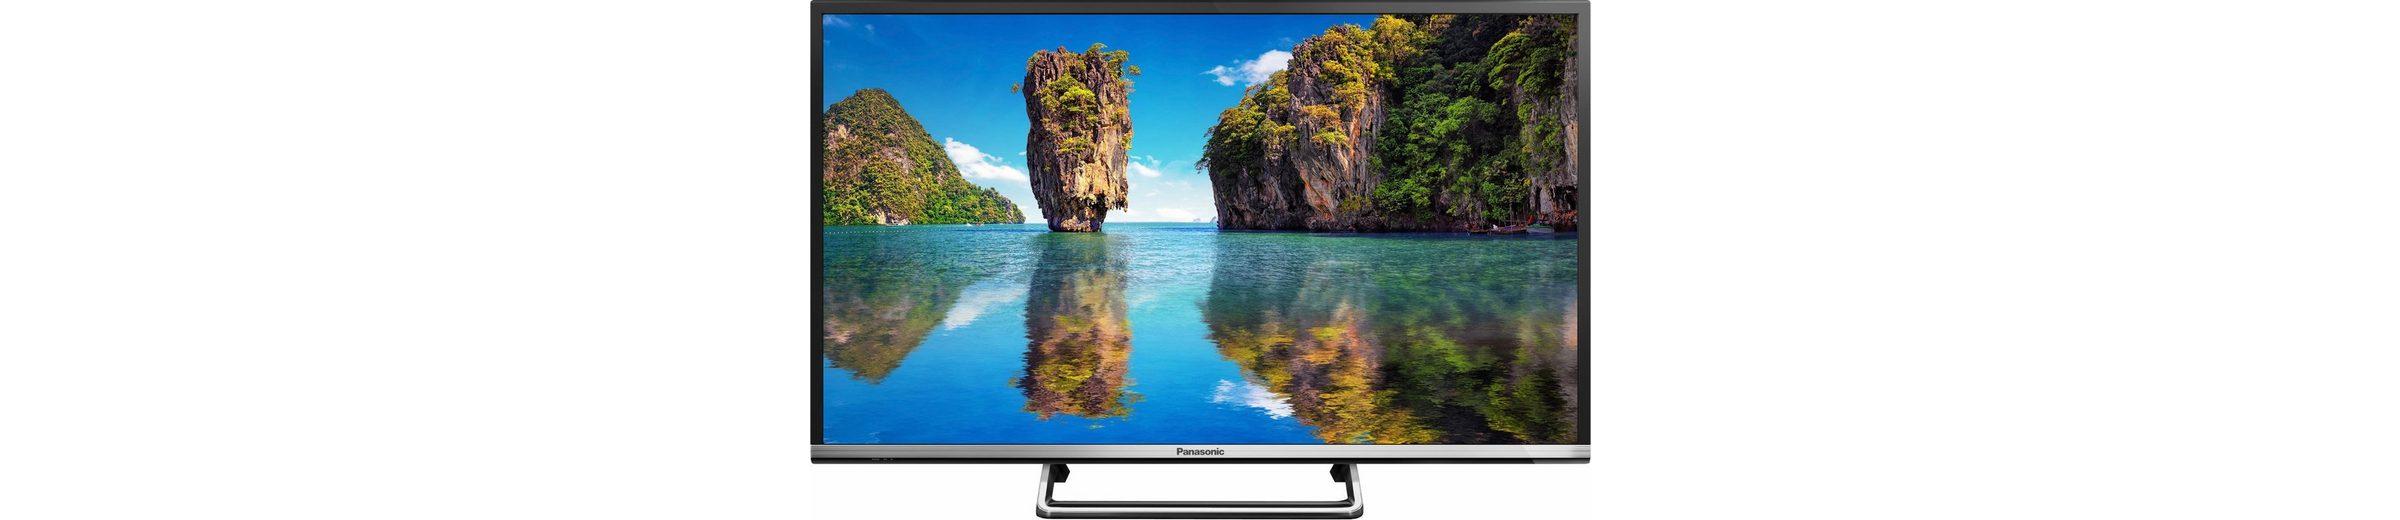 Panasonic TX-32DSW504, LED Fernseher, 80 cm (32 Zoll), HD-ready 720p, Smart-TV